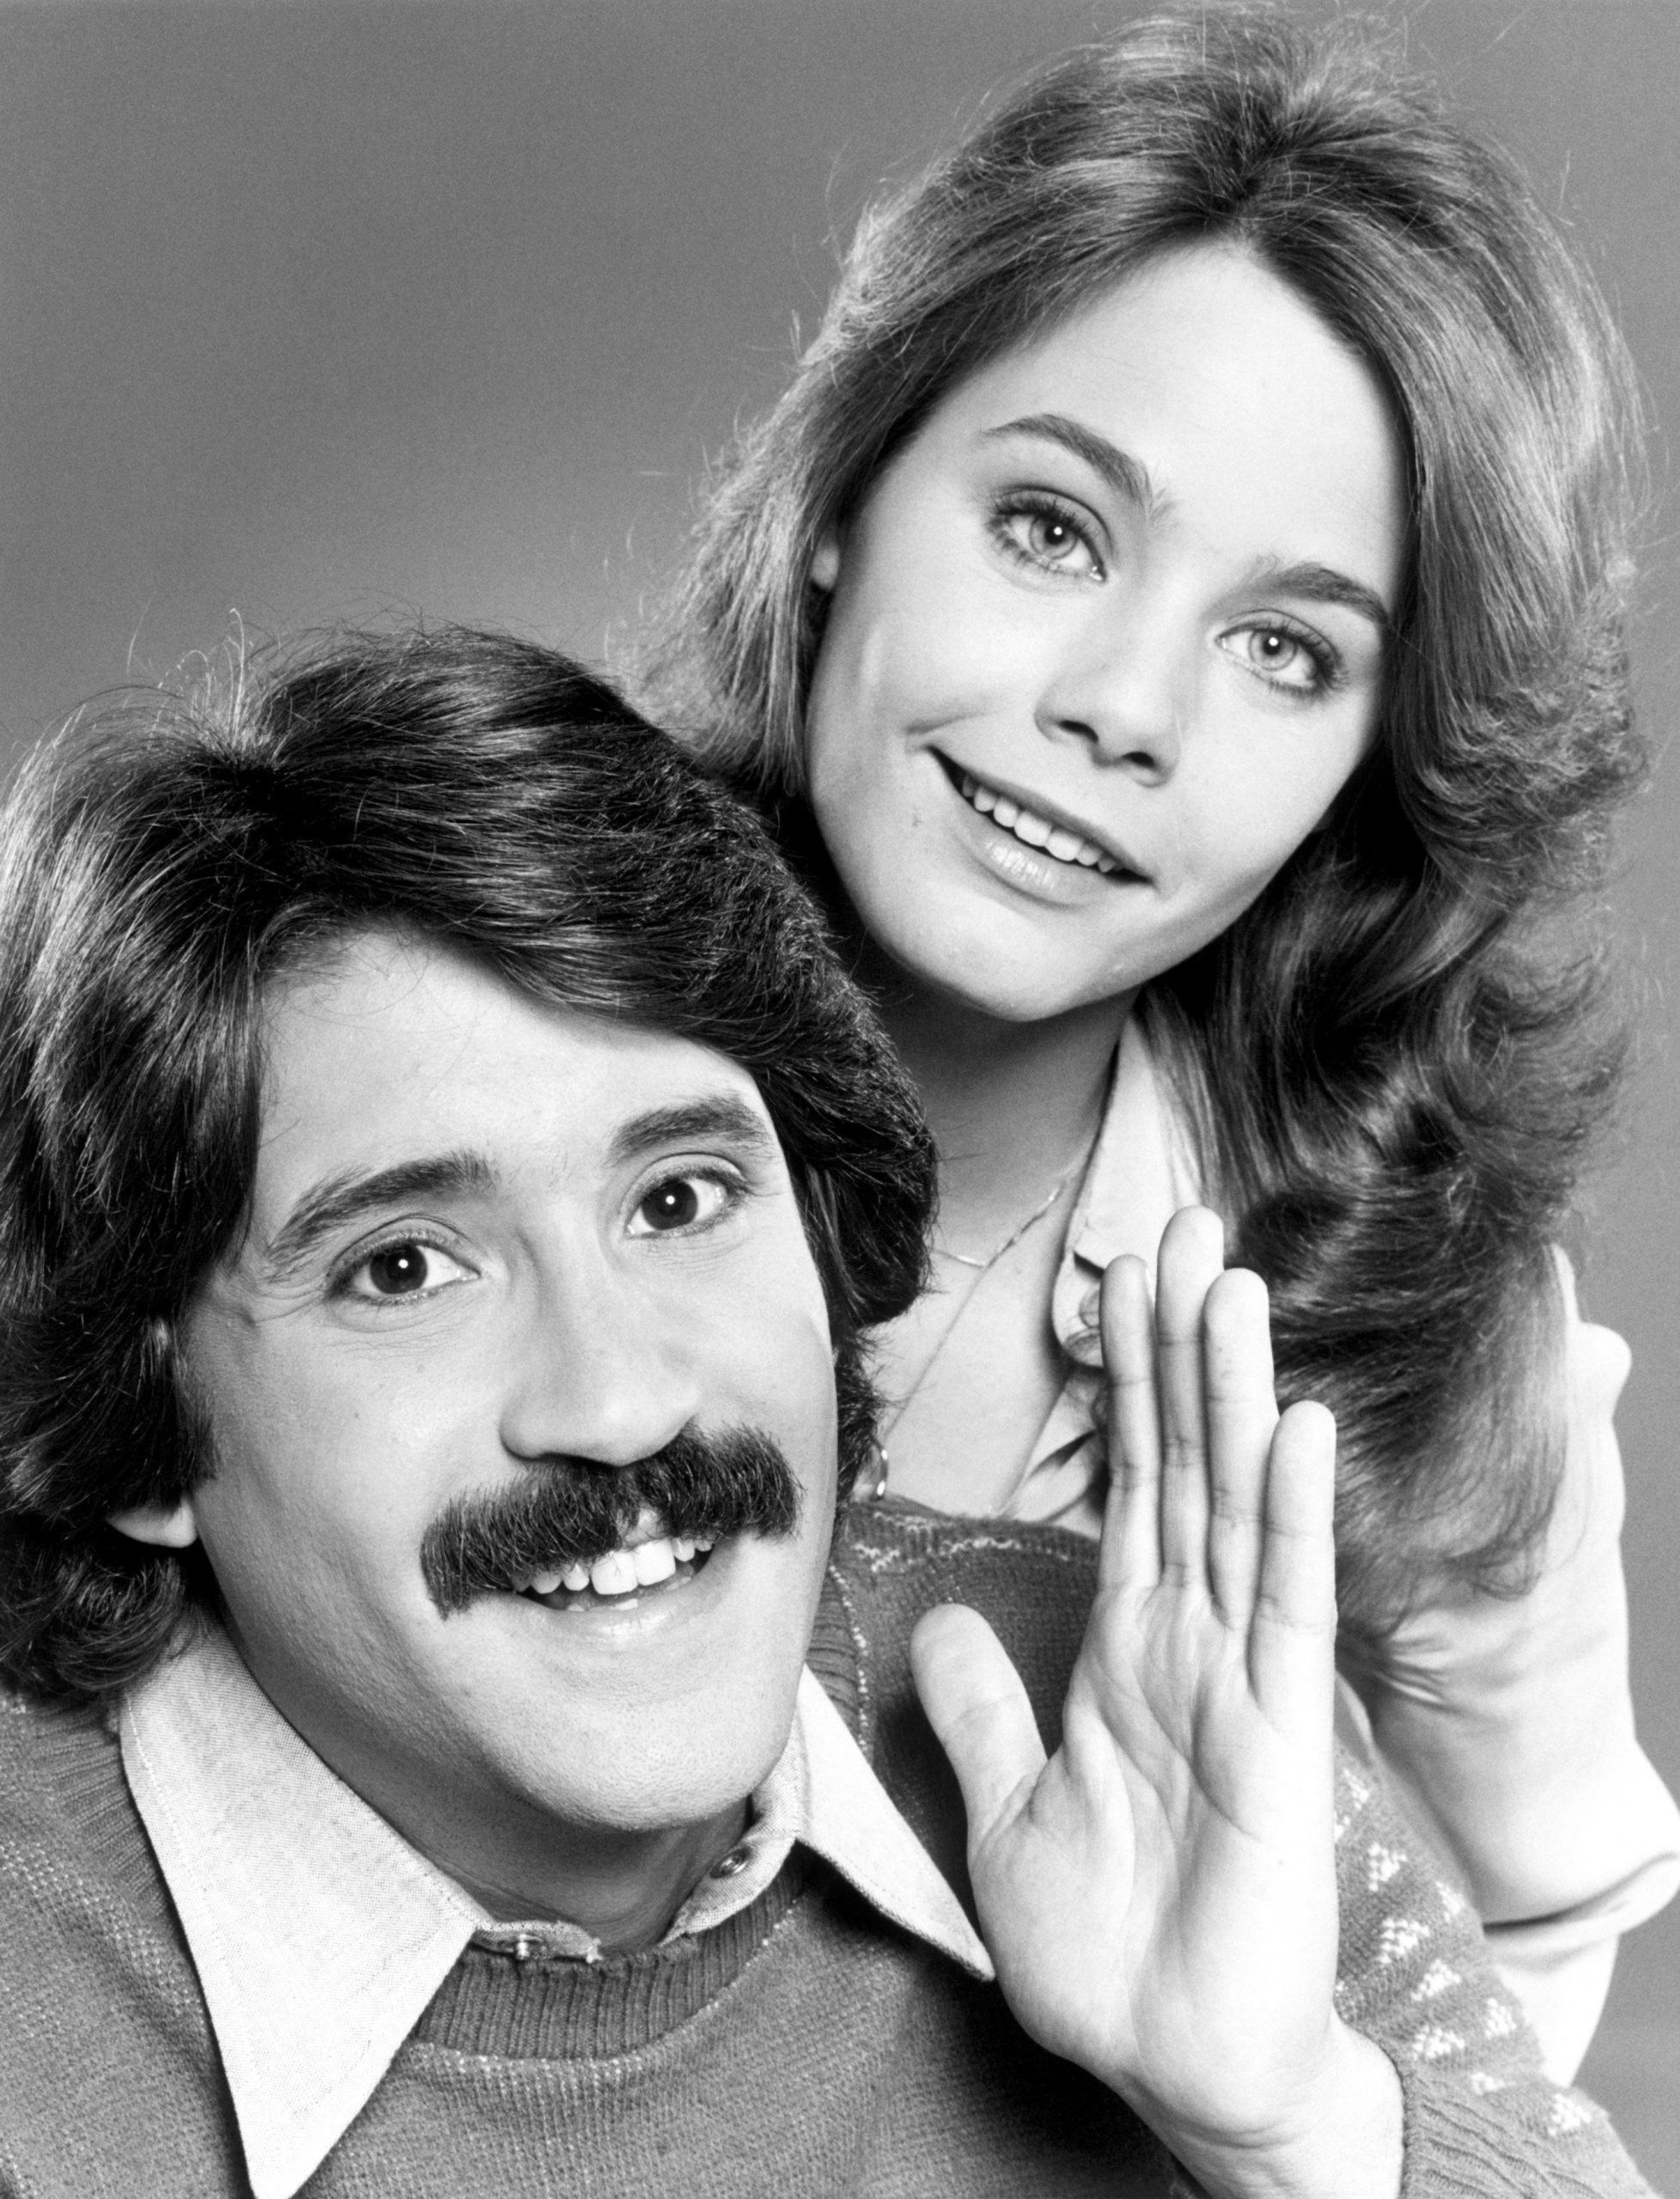 1970s-sitcoms-love-me-do-love-me-not